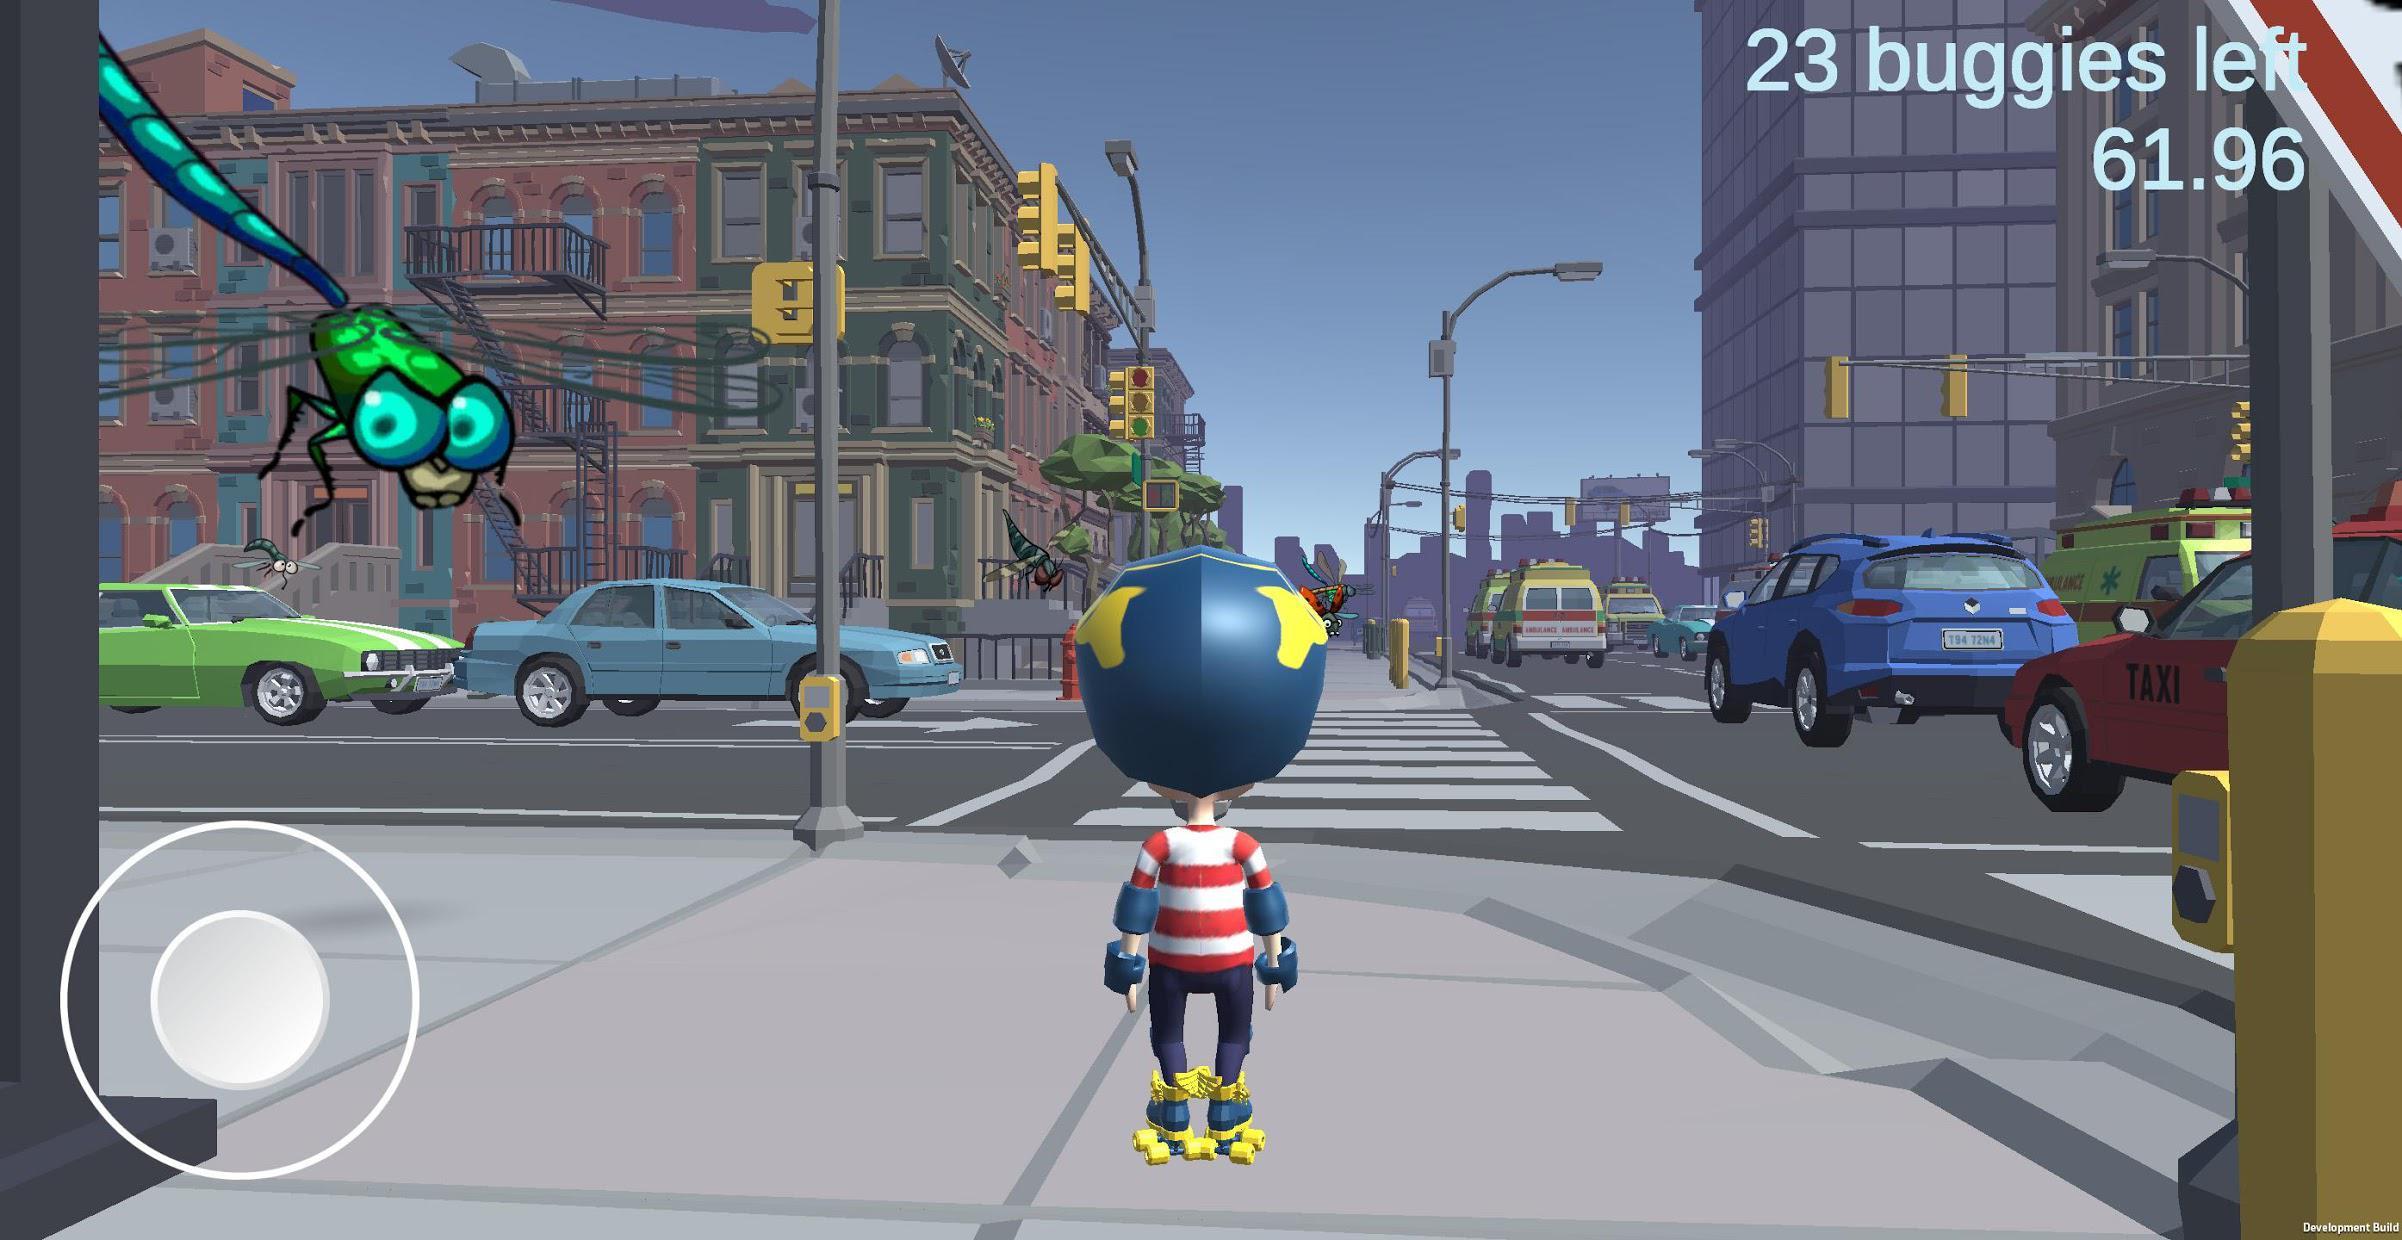 Roller Buggy 游戏截图2